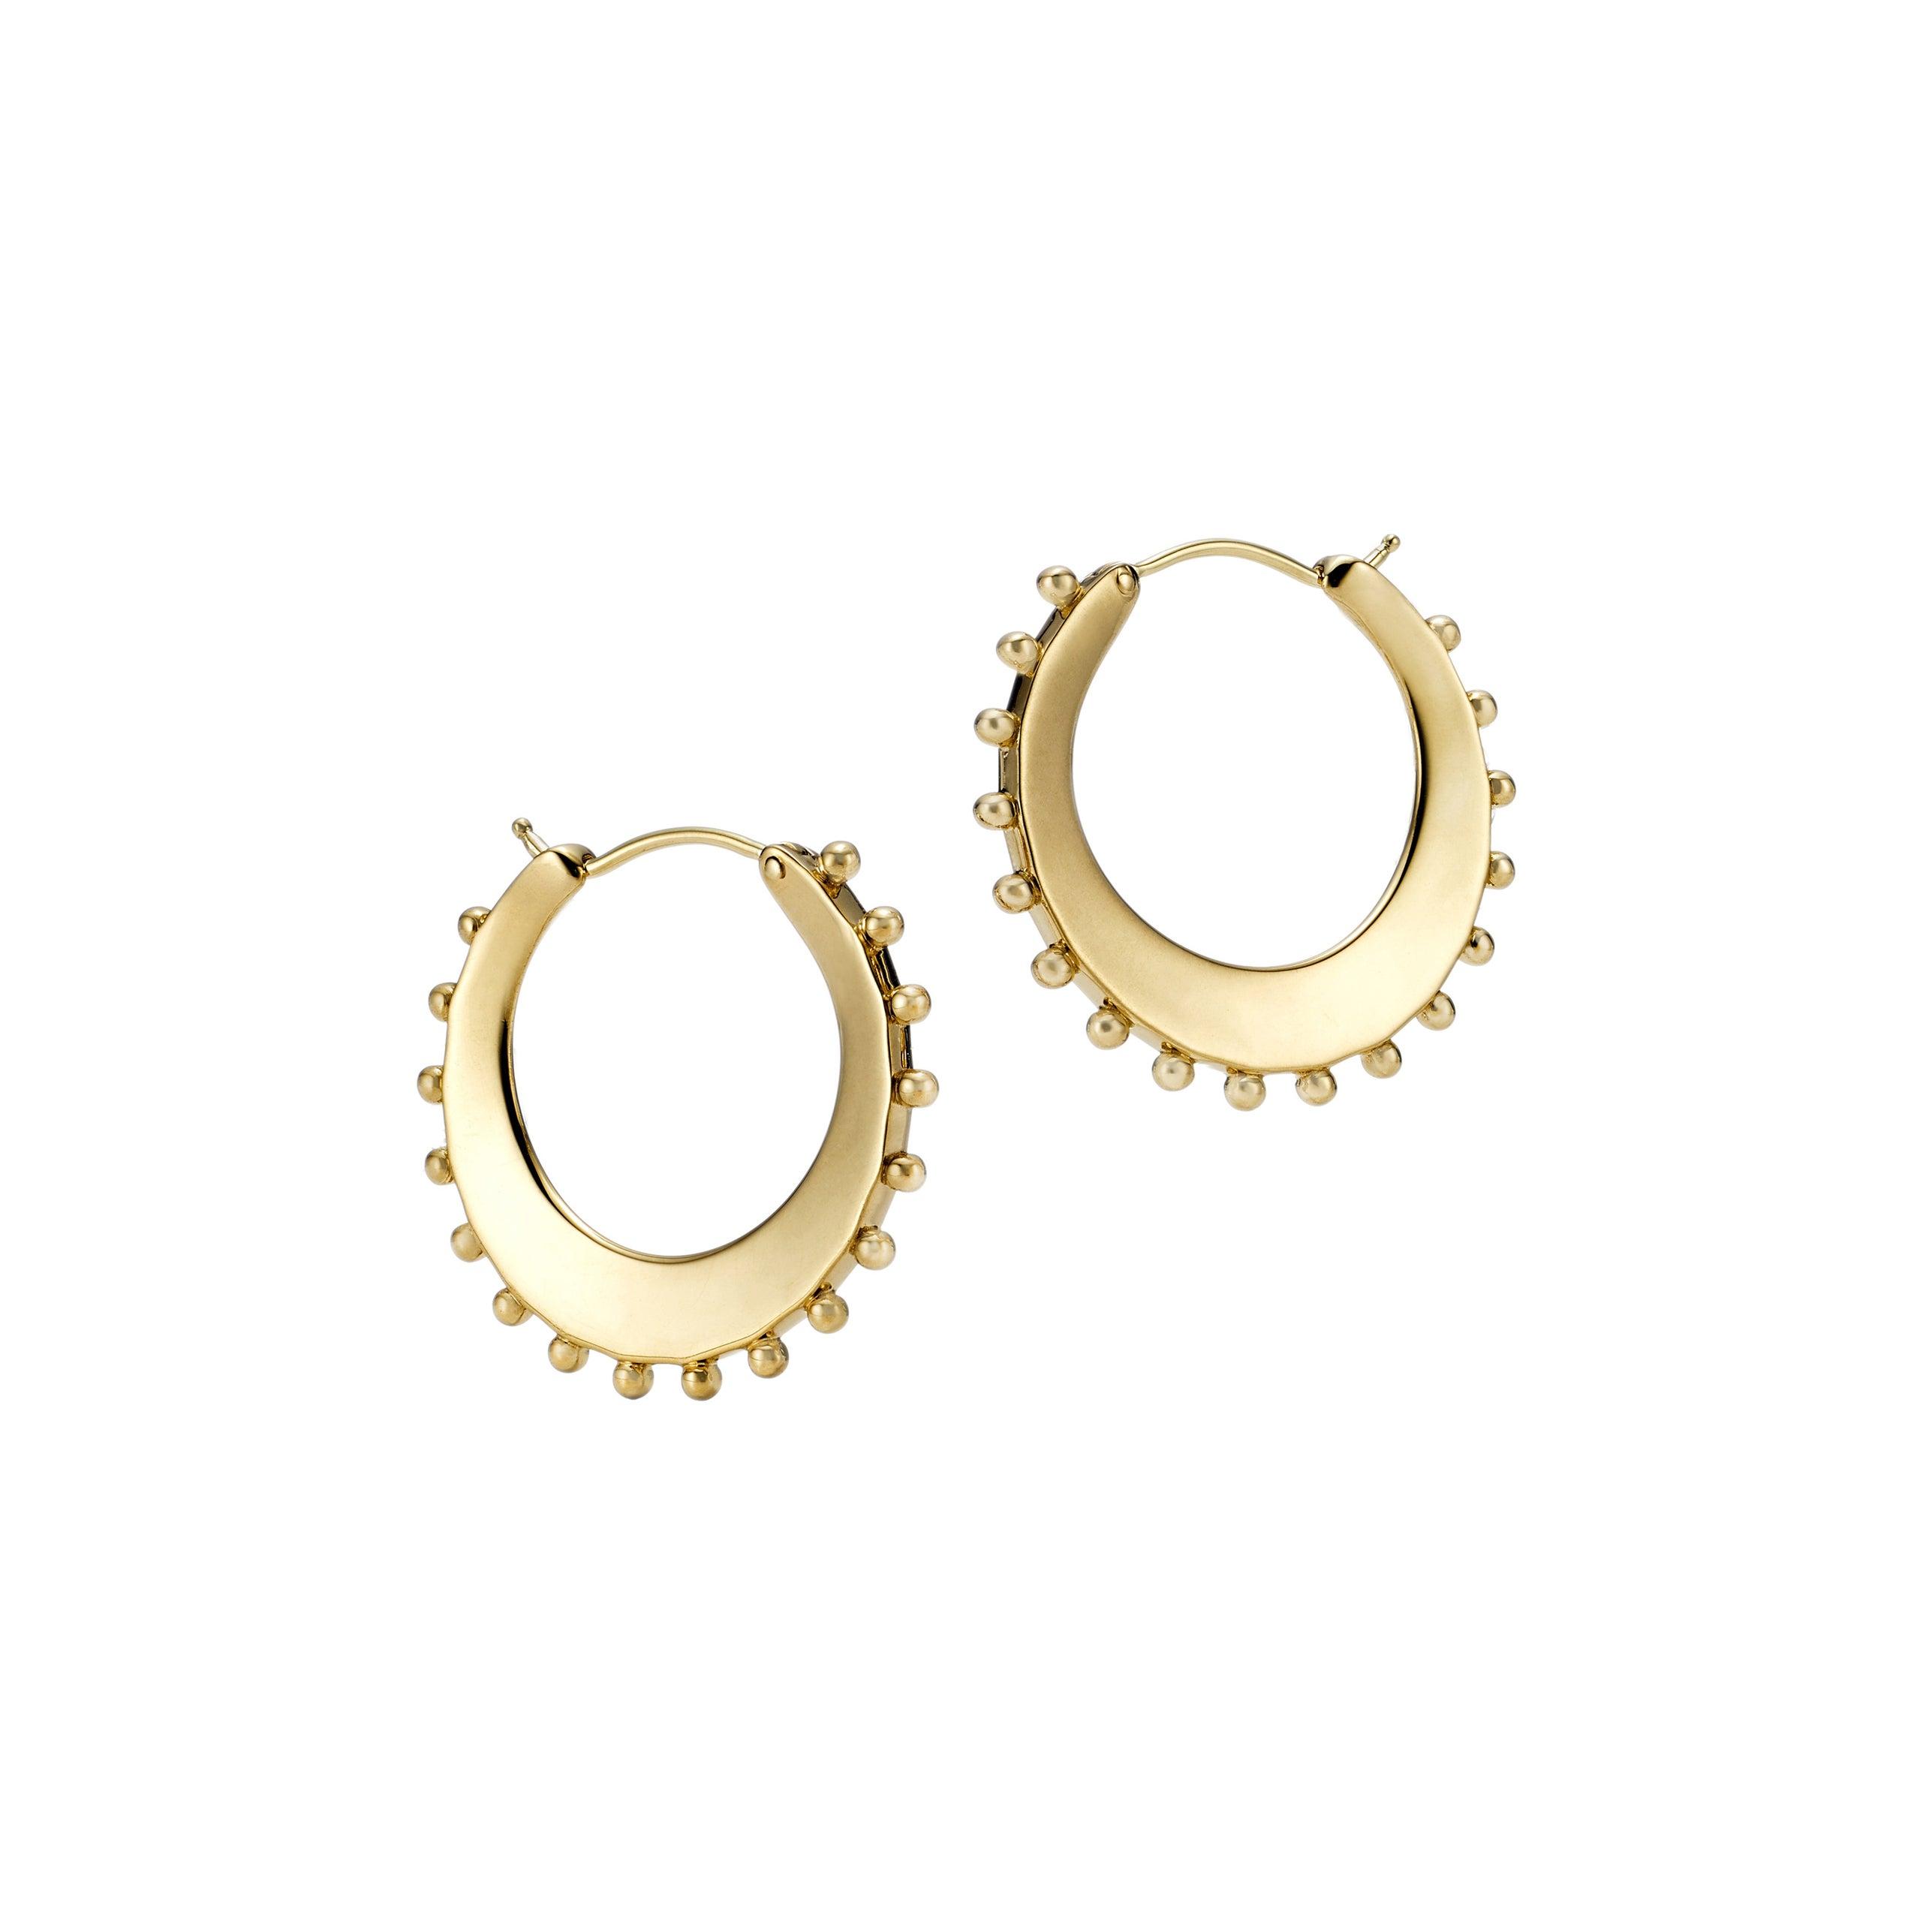 18kt Fairmined Ecological Yellow Gold Beaded Power Hoop Earrings